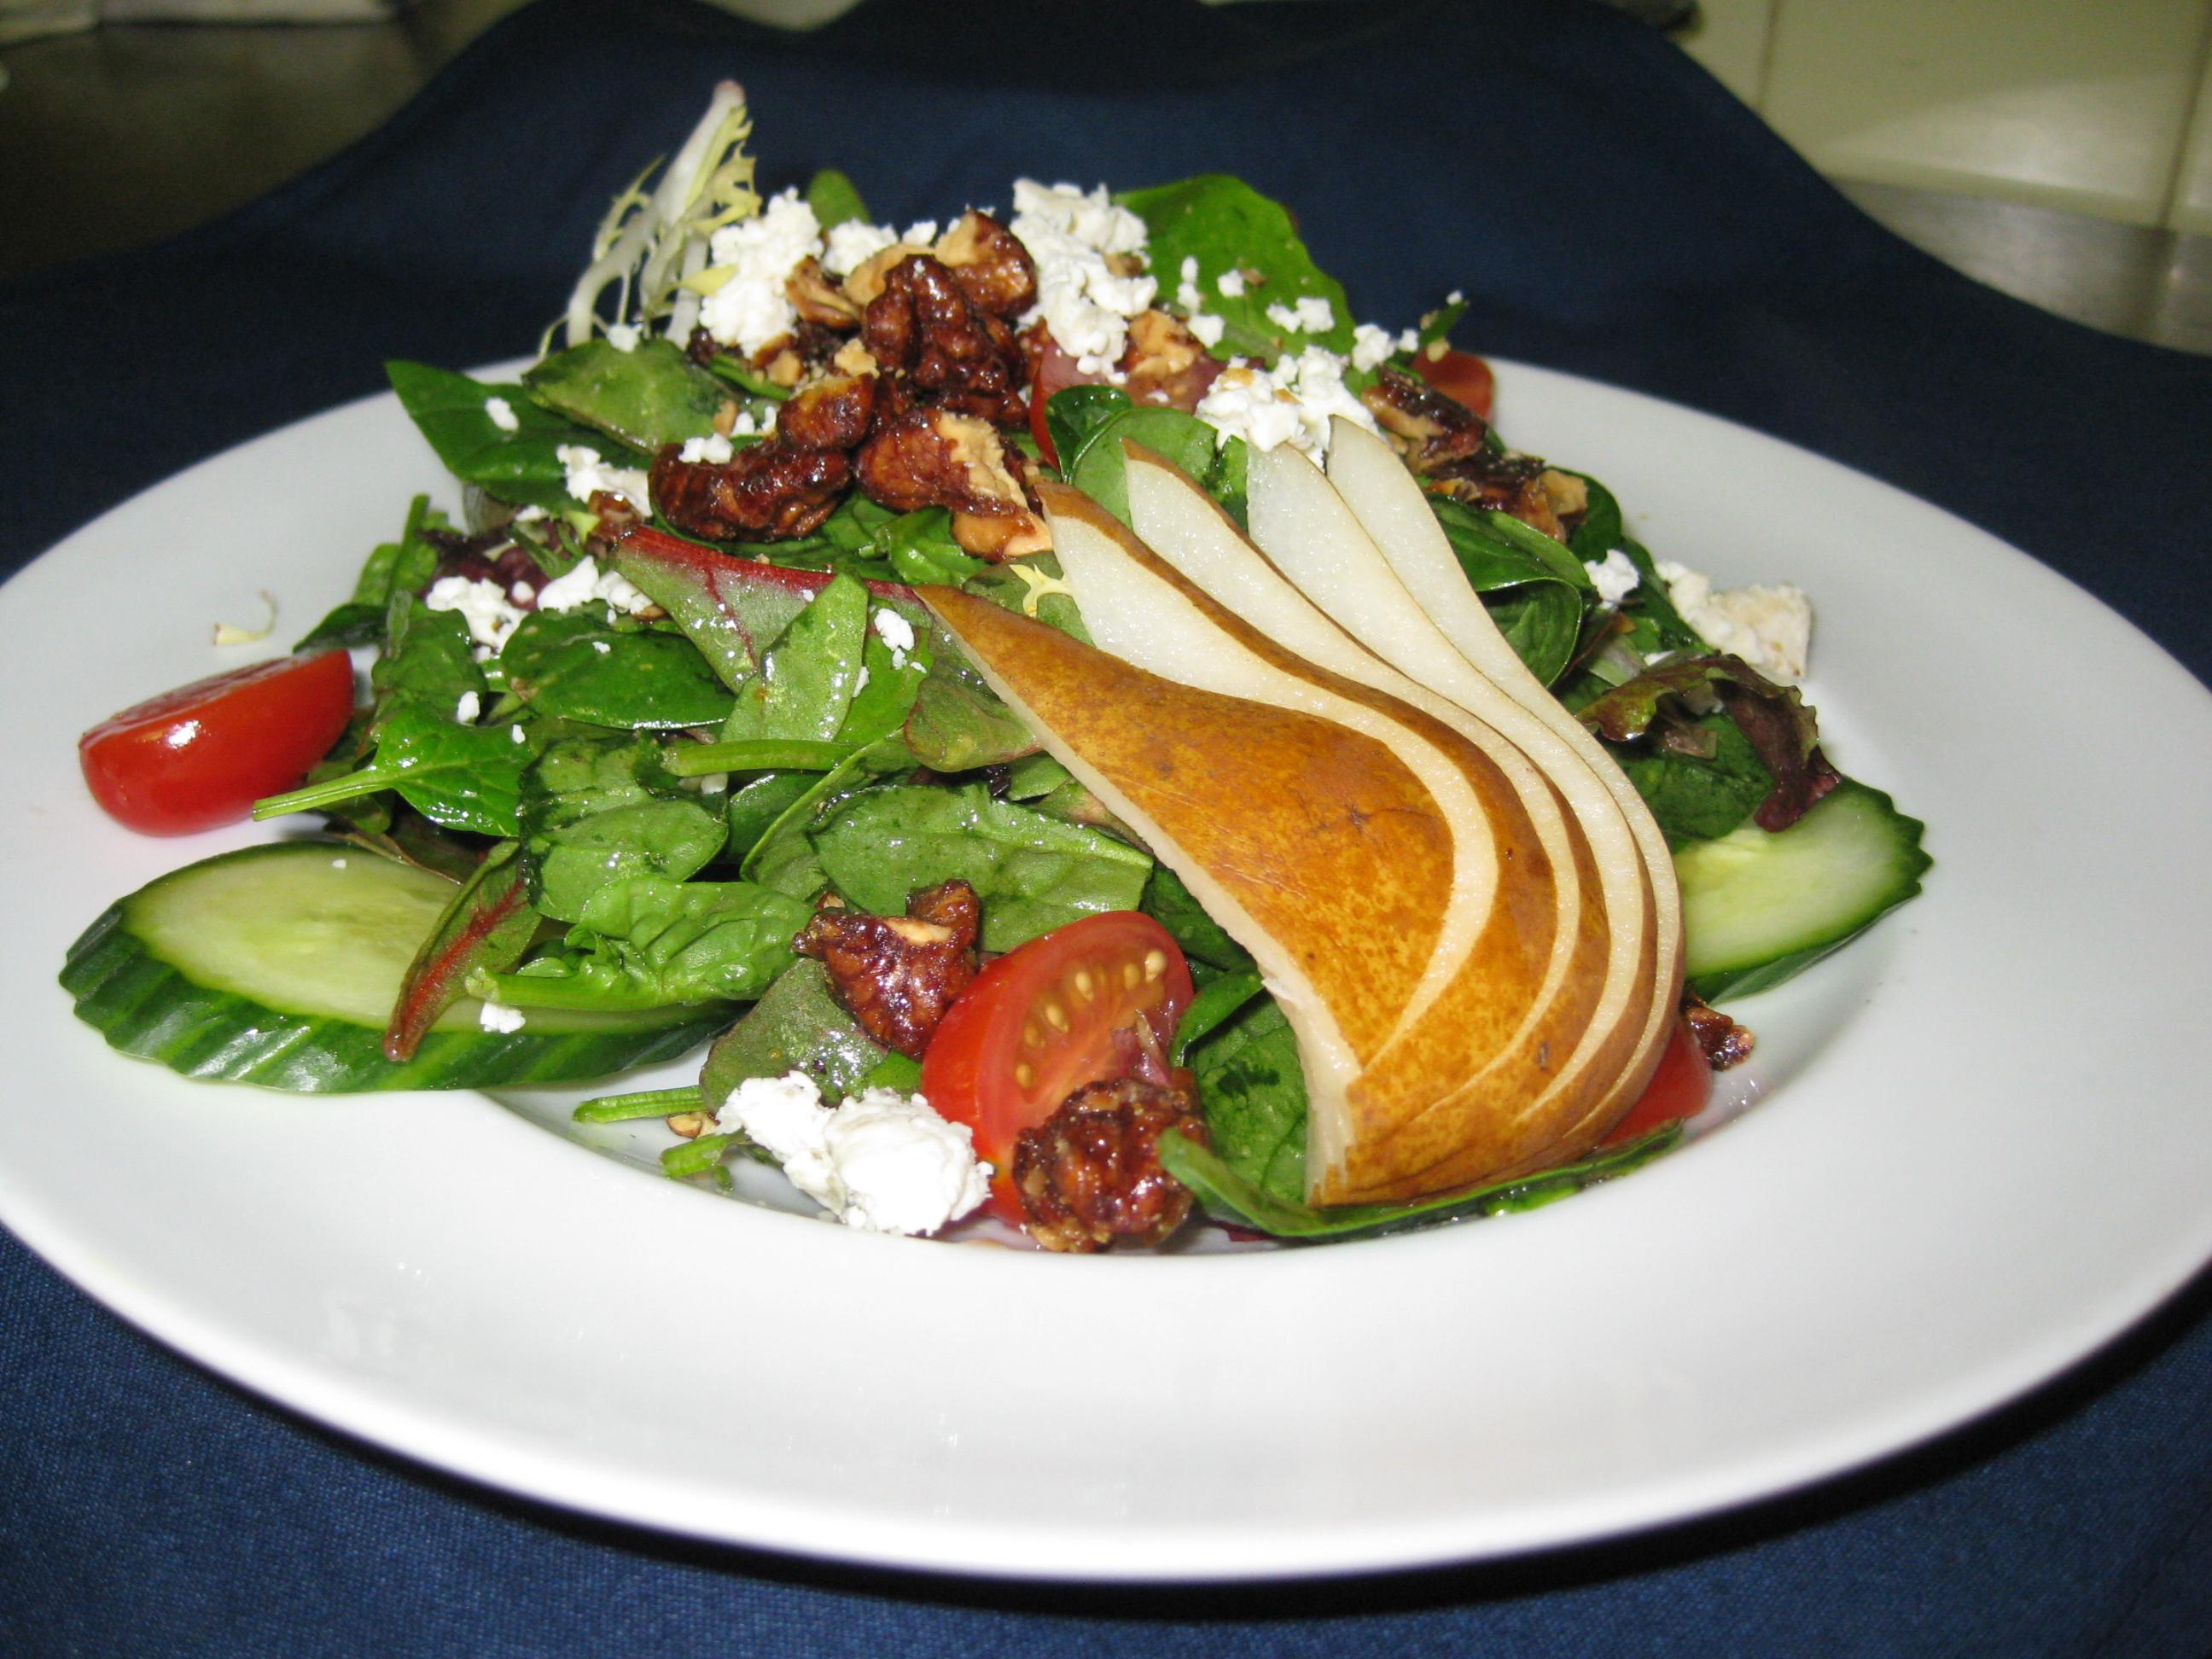 Giulio's Salad